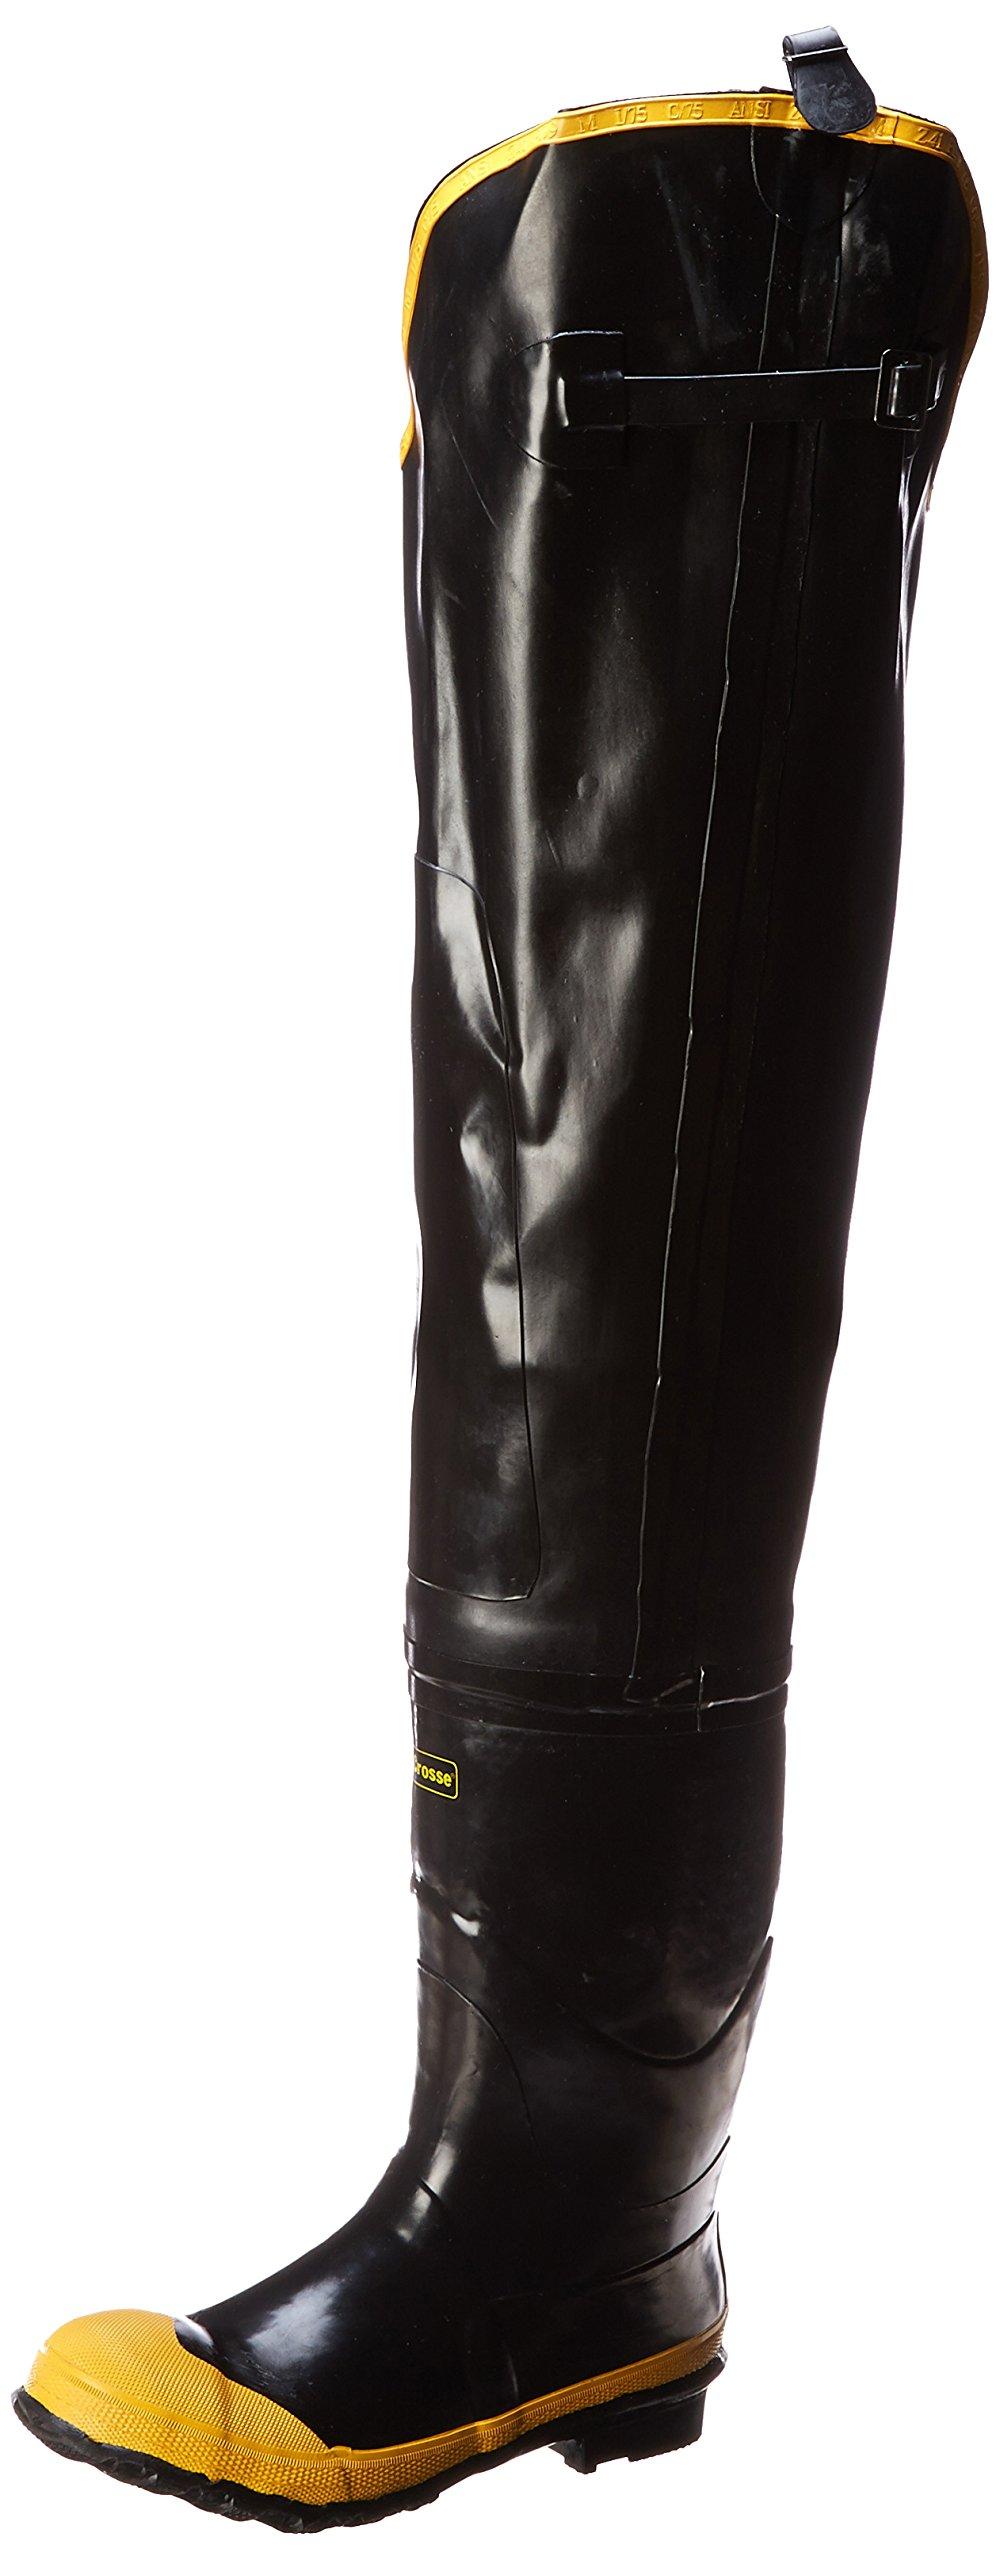 Lacrosse Men's Economy Hip 32 Inch Steel Toe Boot,Black,8 M US